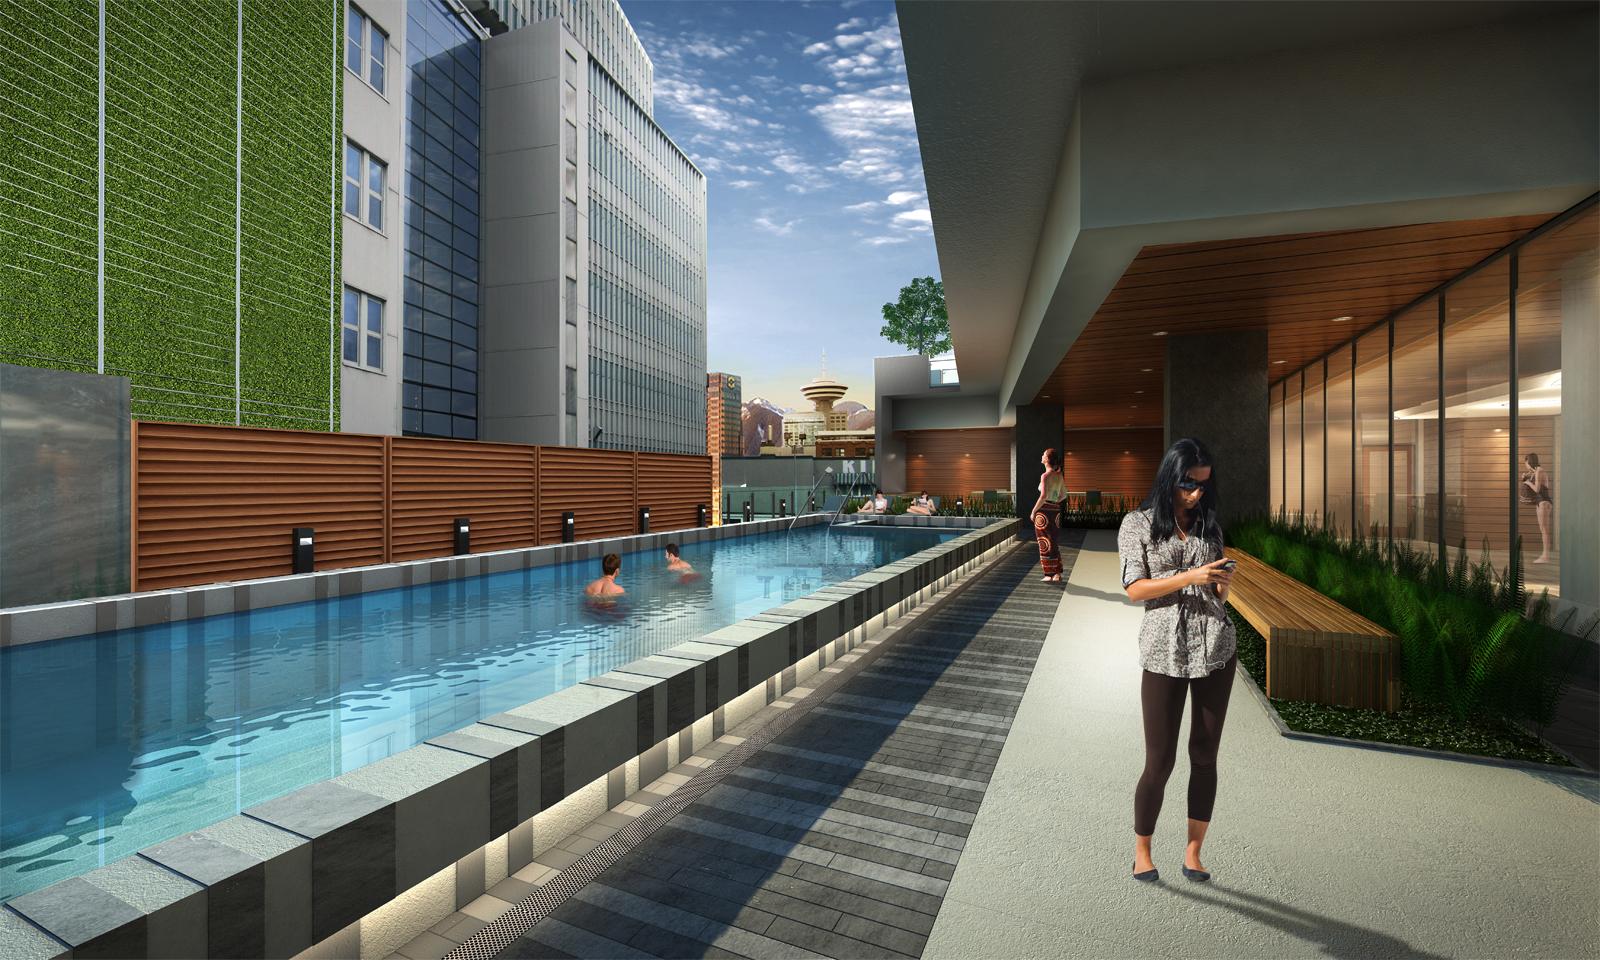 Telus garden pool rendering.jpg